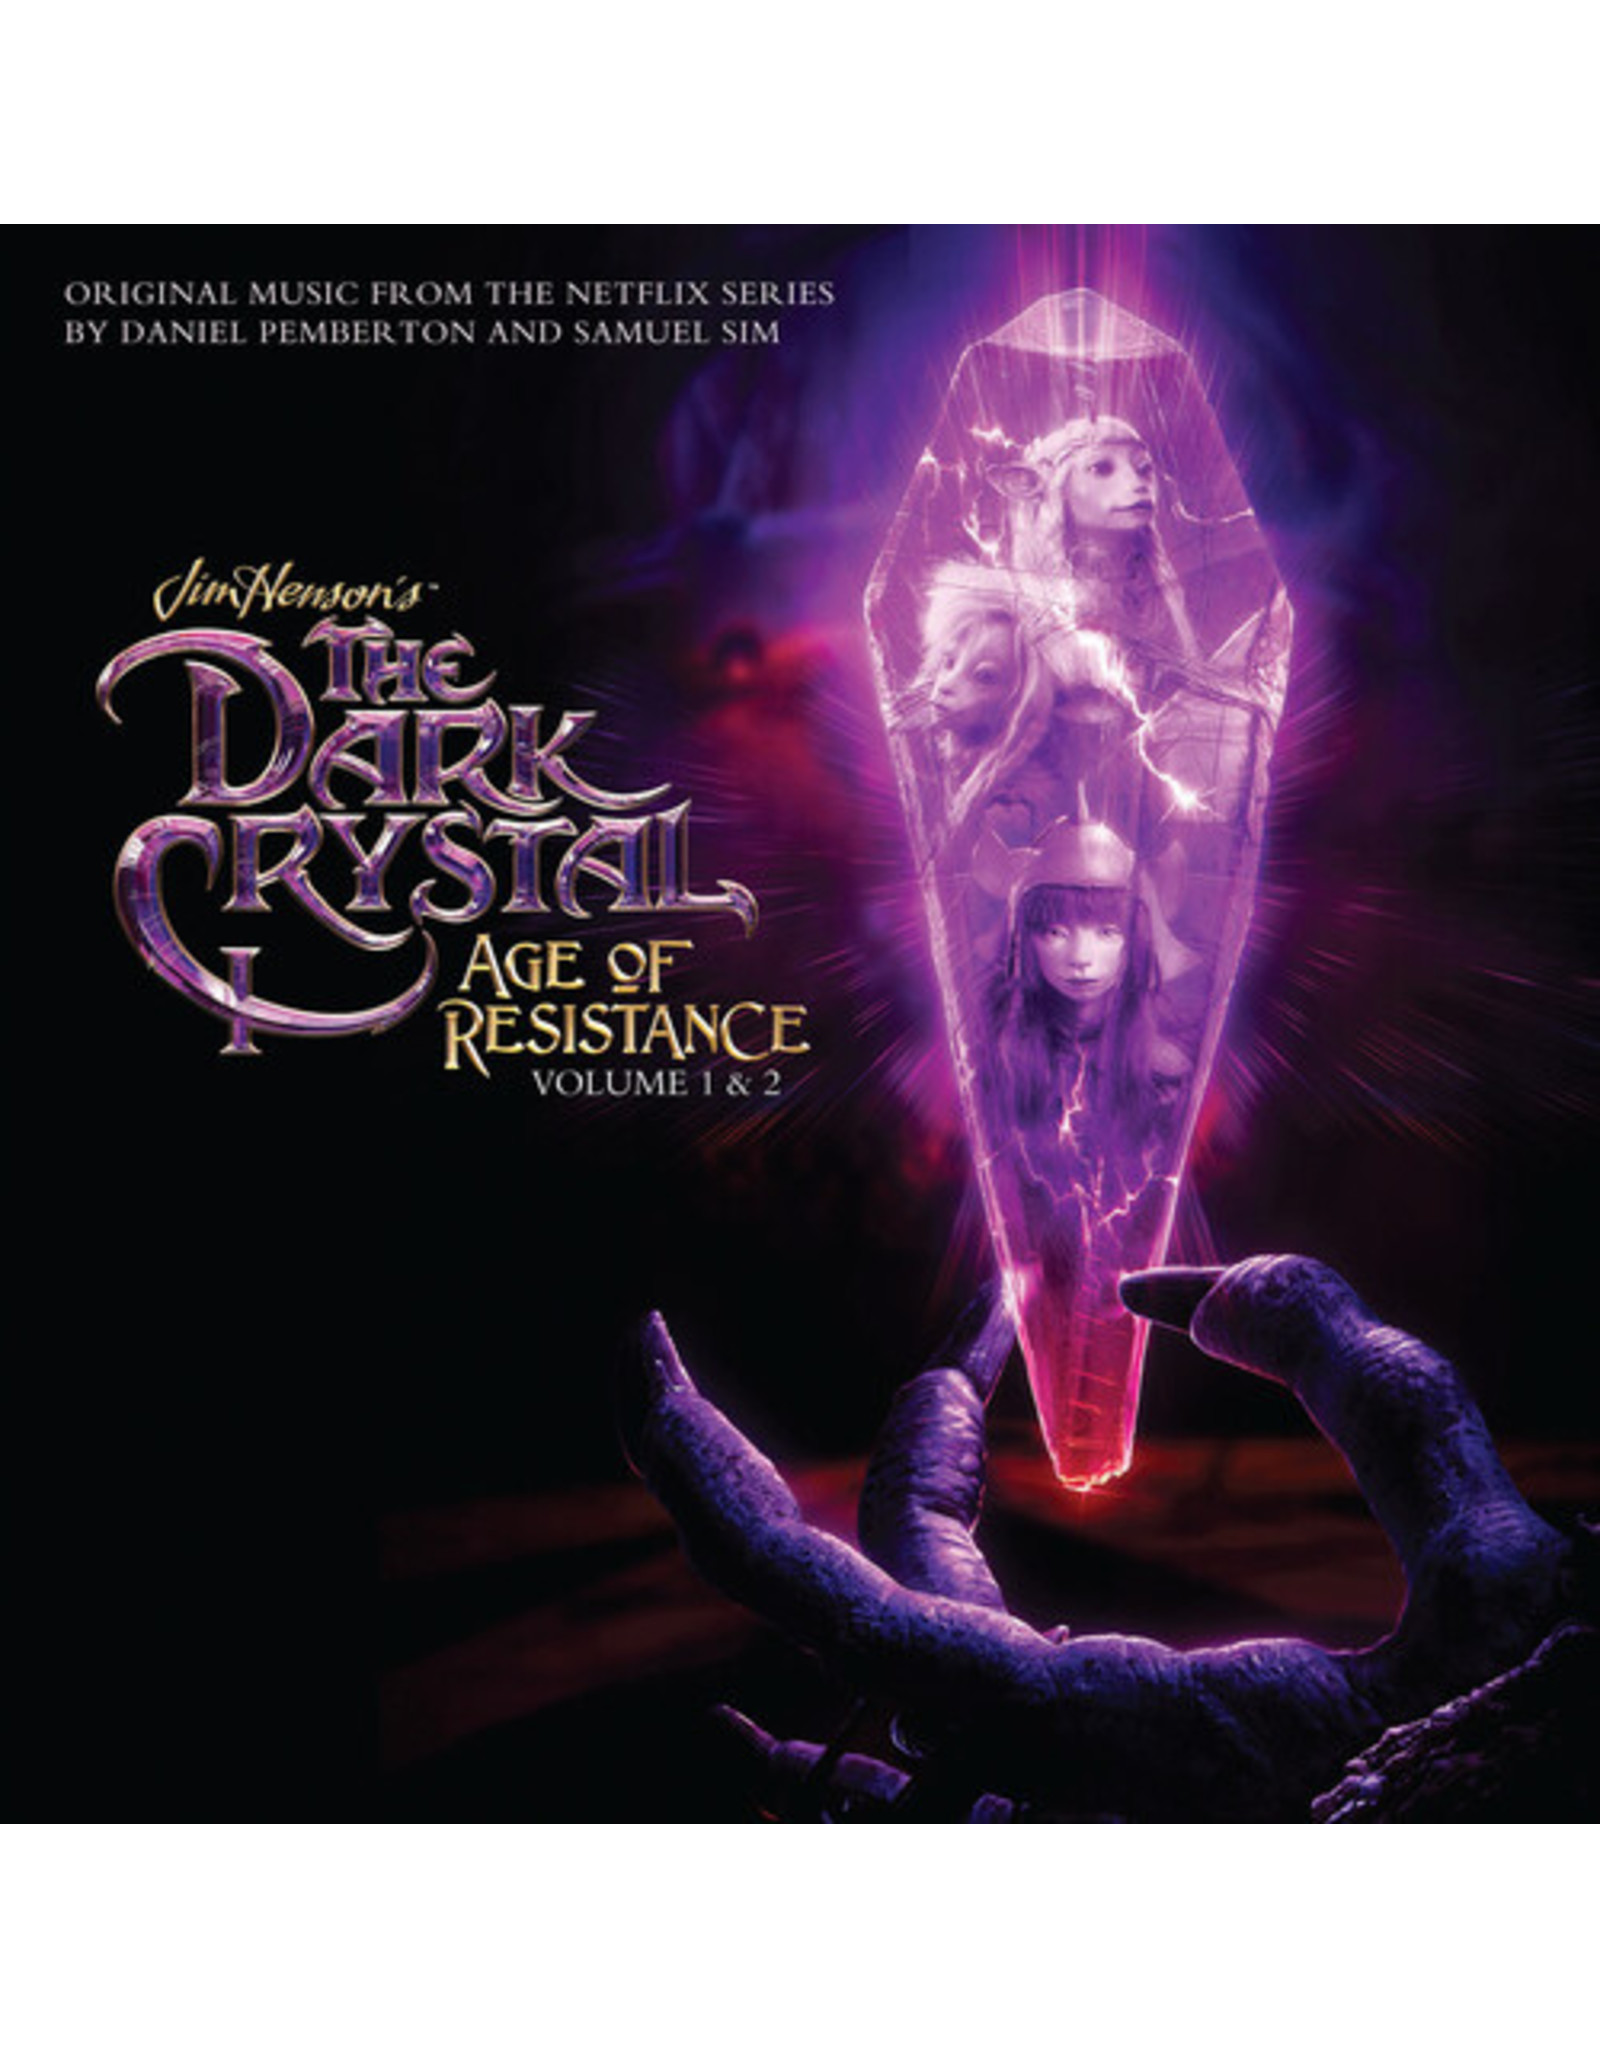 Daniel Pemberton & Samuel Sim - Dark Crystal: Age Of Resistance Volume 1&2 OST 2LP